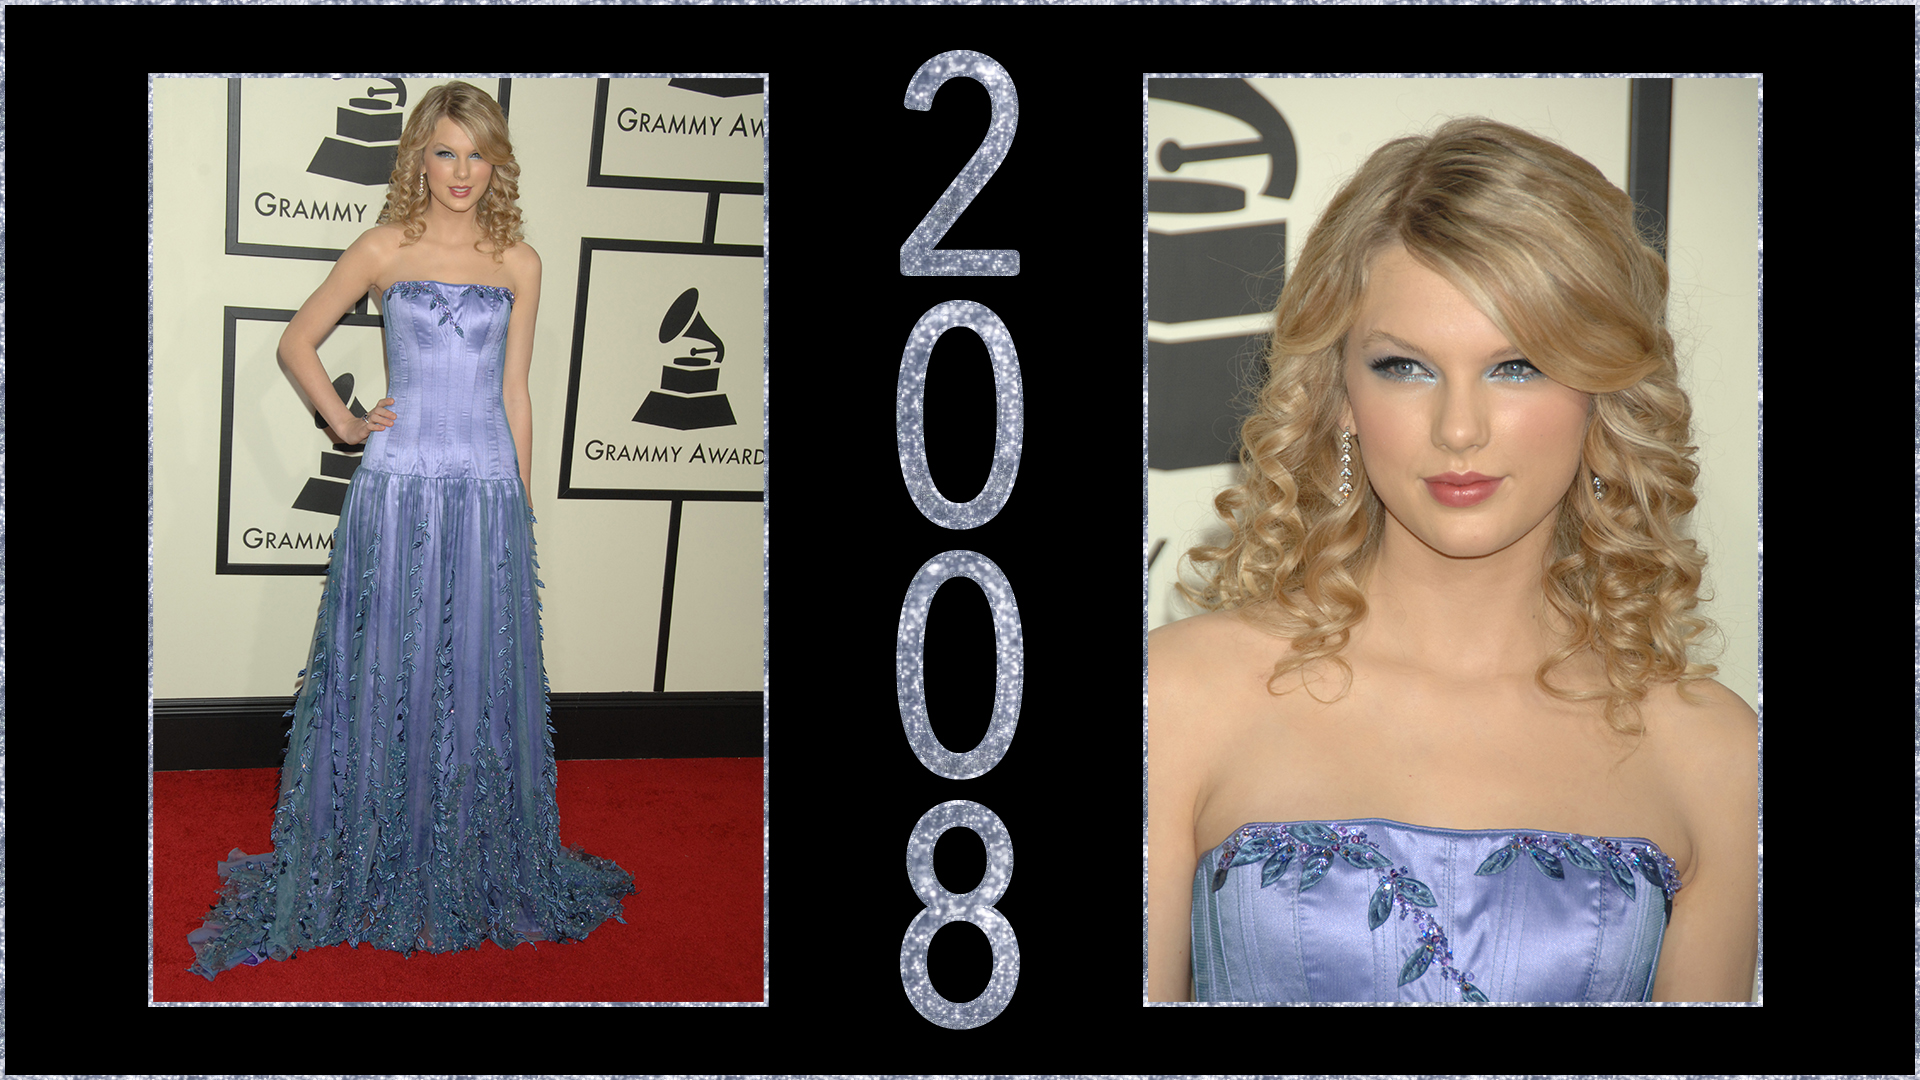 2008: A lilac